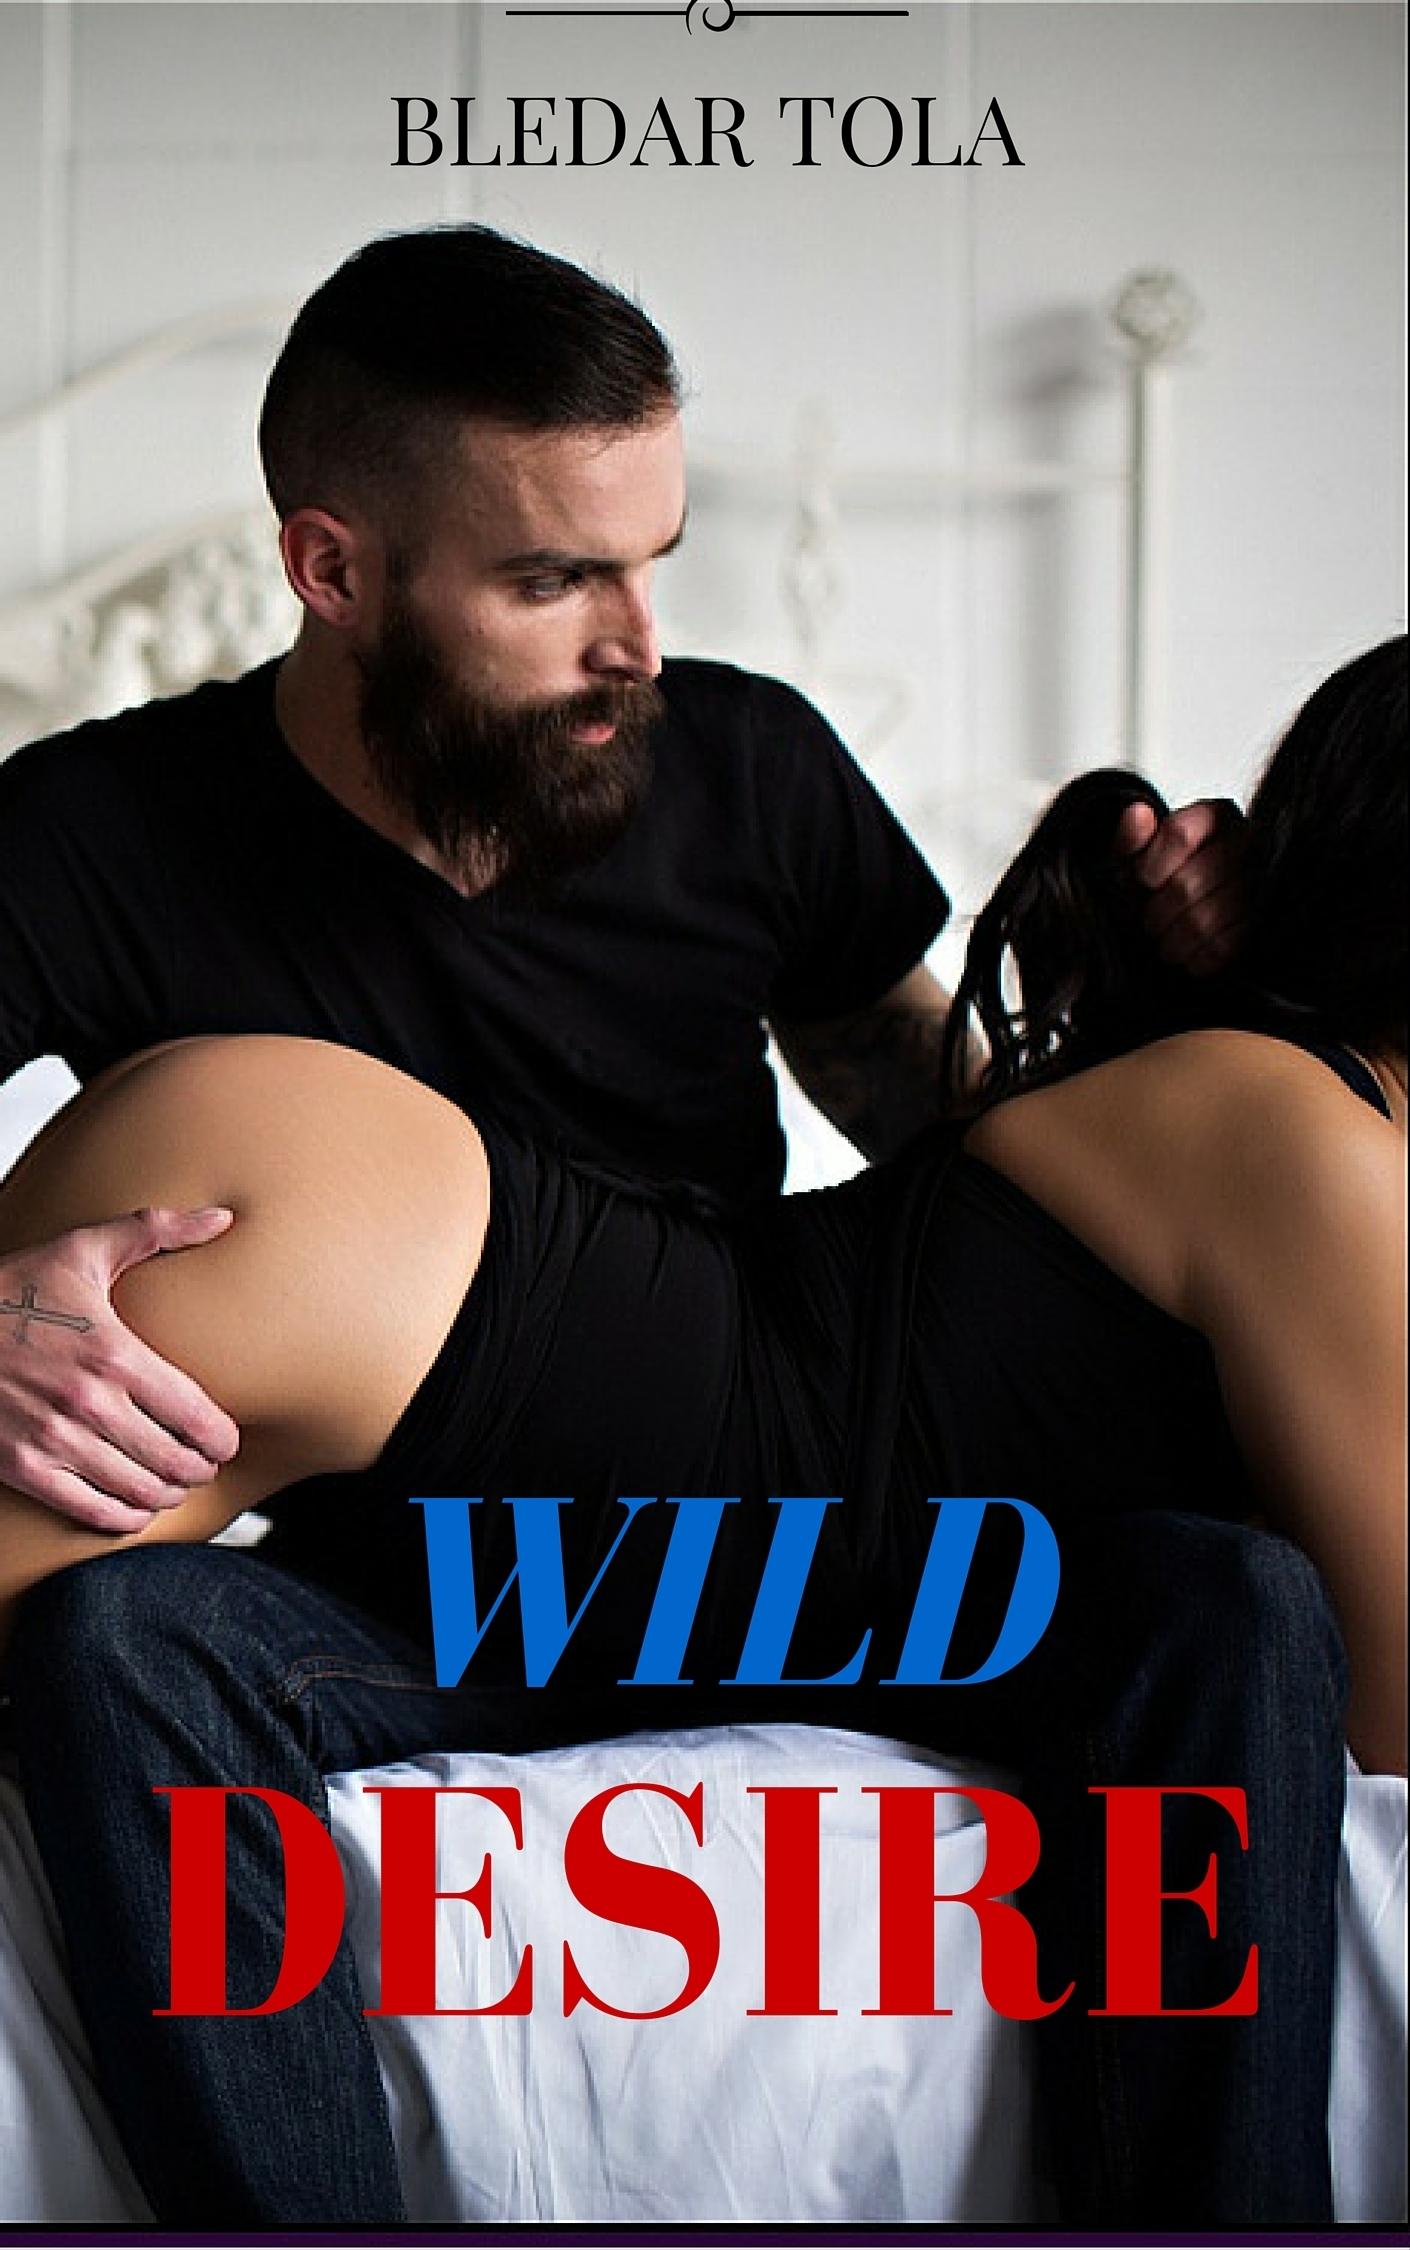 Wild Desire Bledar tola